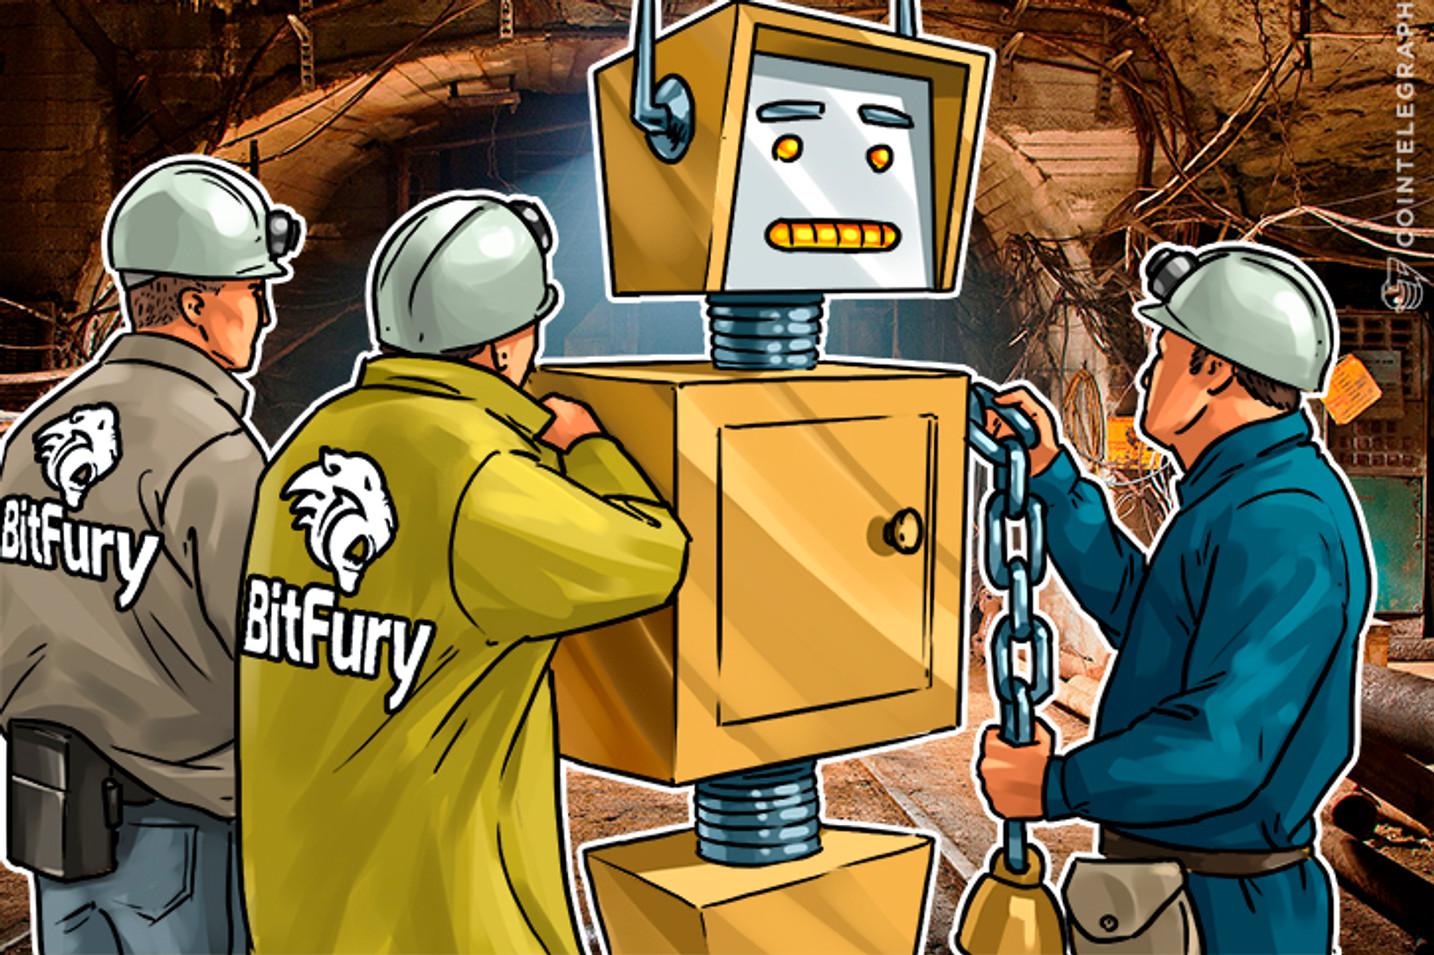 Bitcoin Mining Giant Bitfury Releases Enterprise-Grade Blockchain